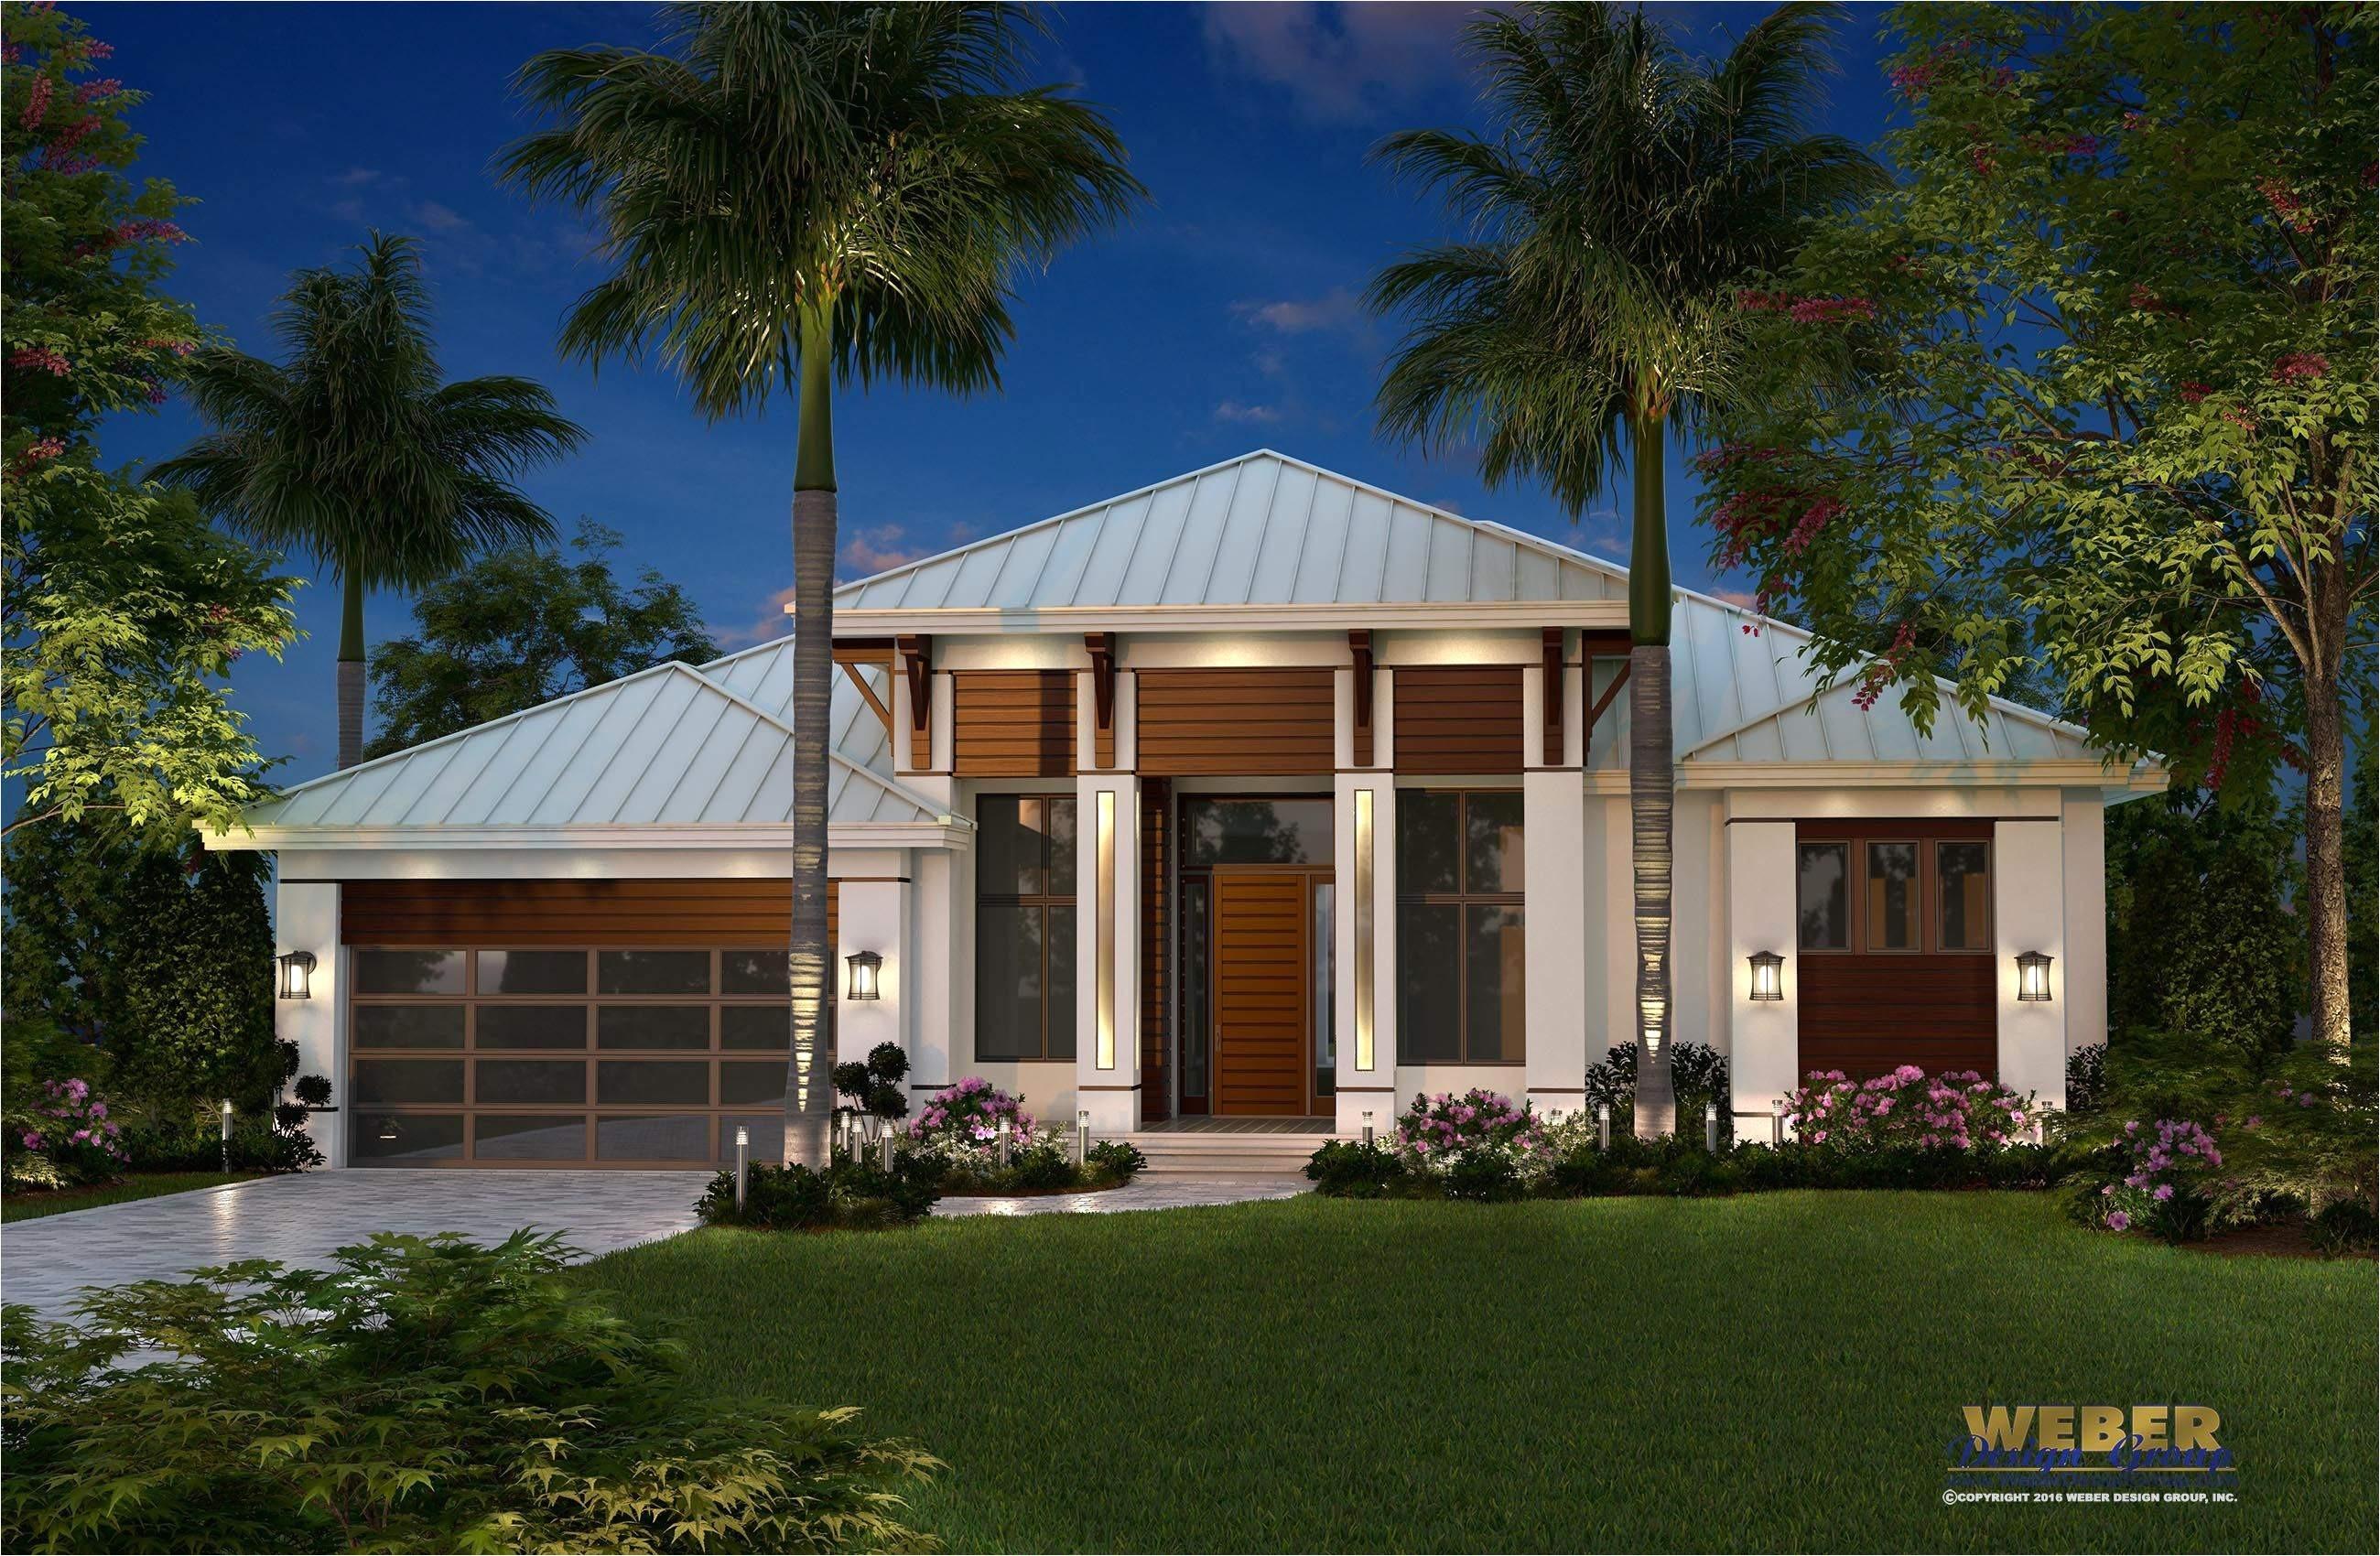 Luxury Home Plans 2018 Mediterranean Home Plans Narrow Lot Luxury Beach House